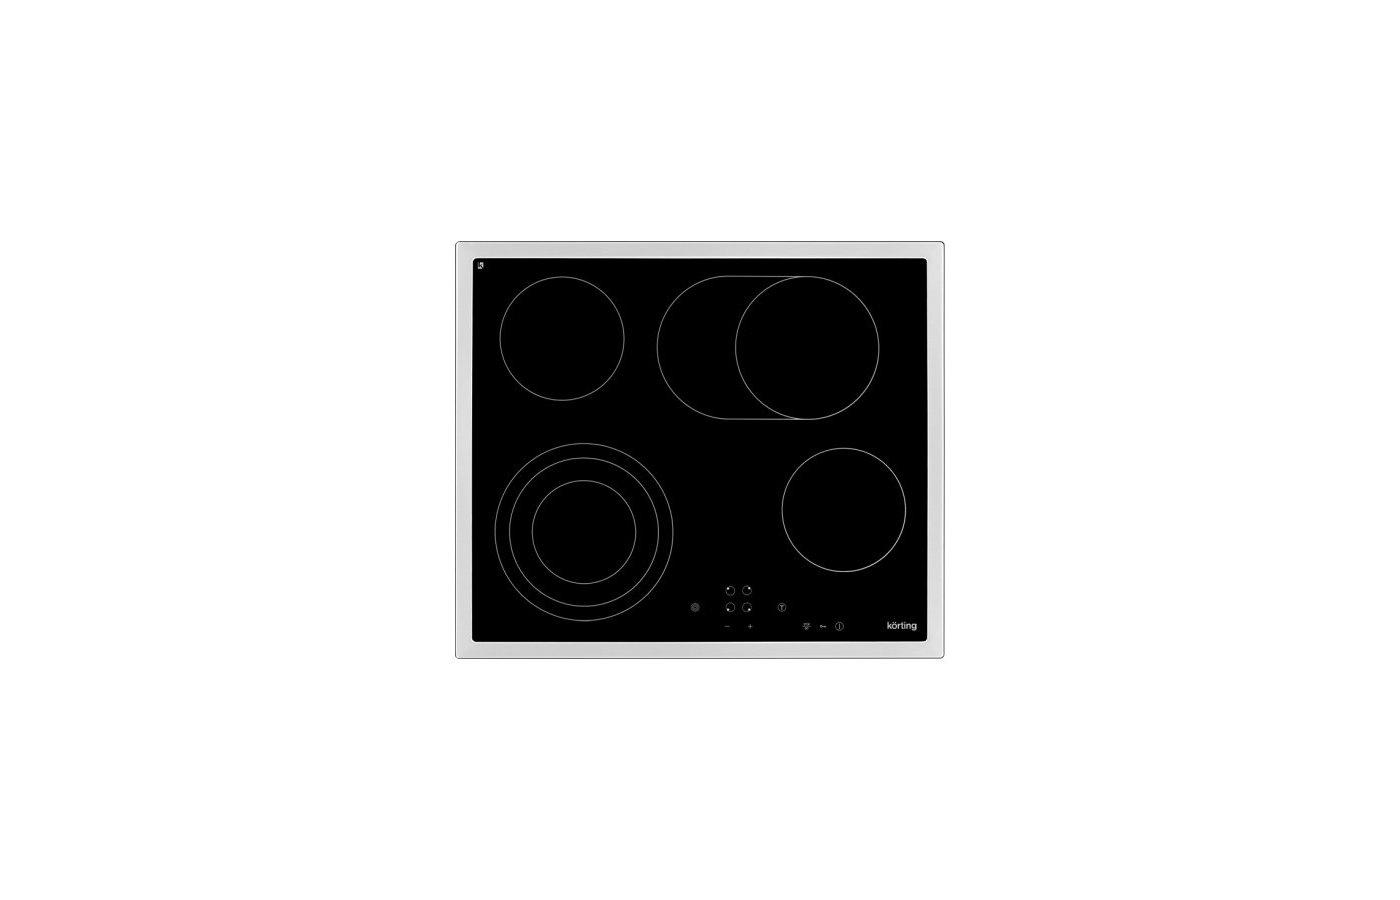 Варочная панель KORTING HK 6305 X